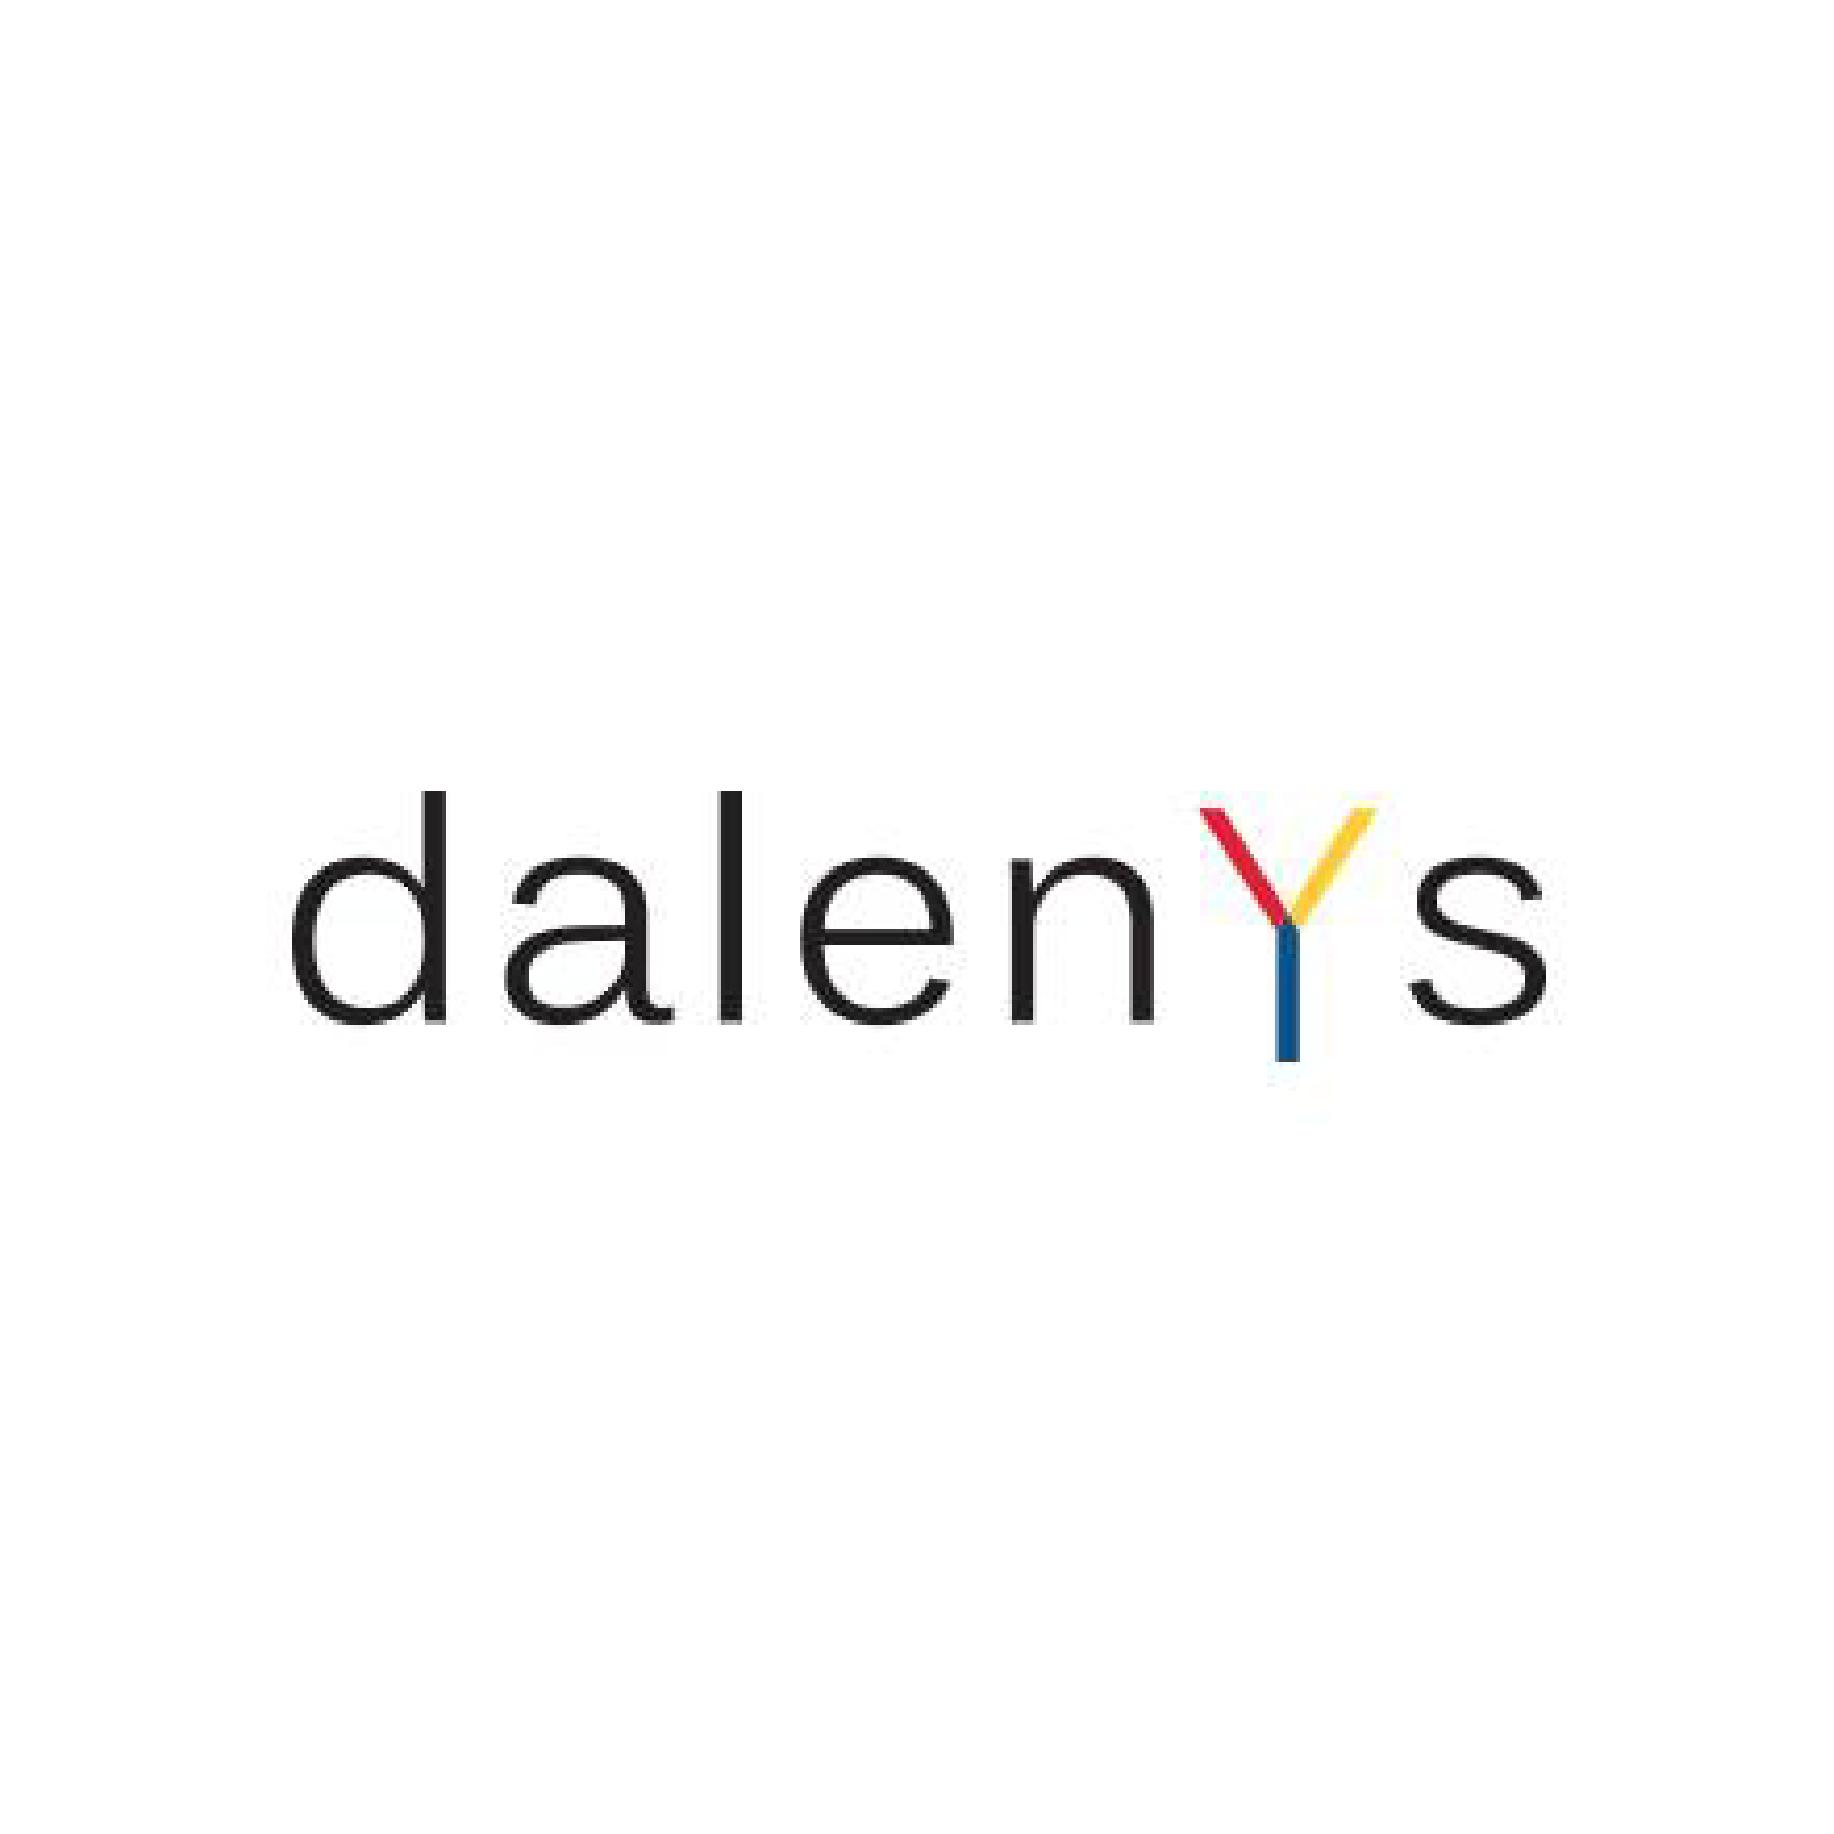 Danelys_Plan de travail 1.png